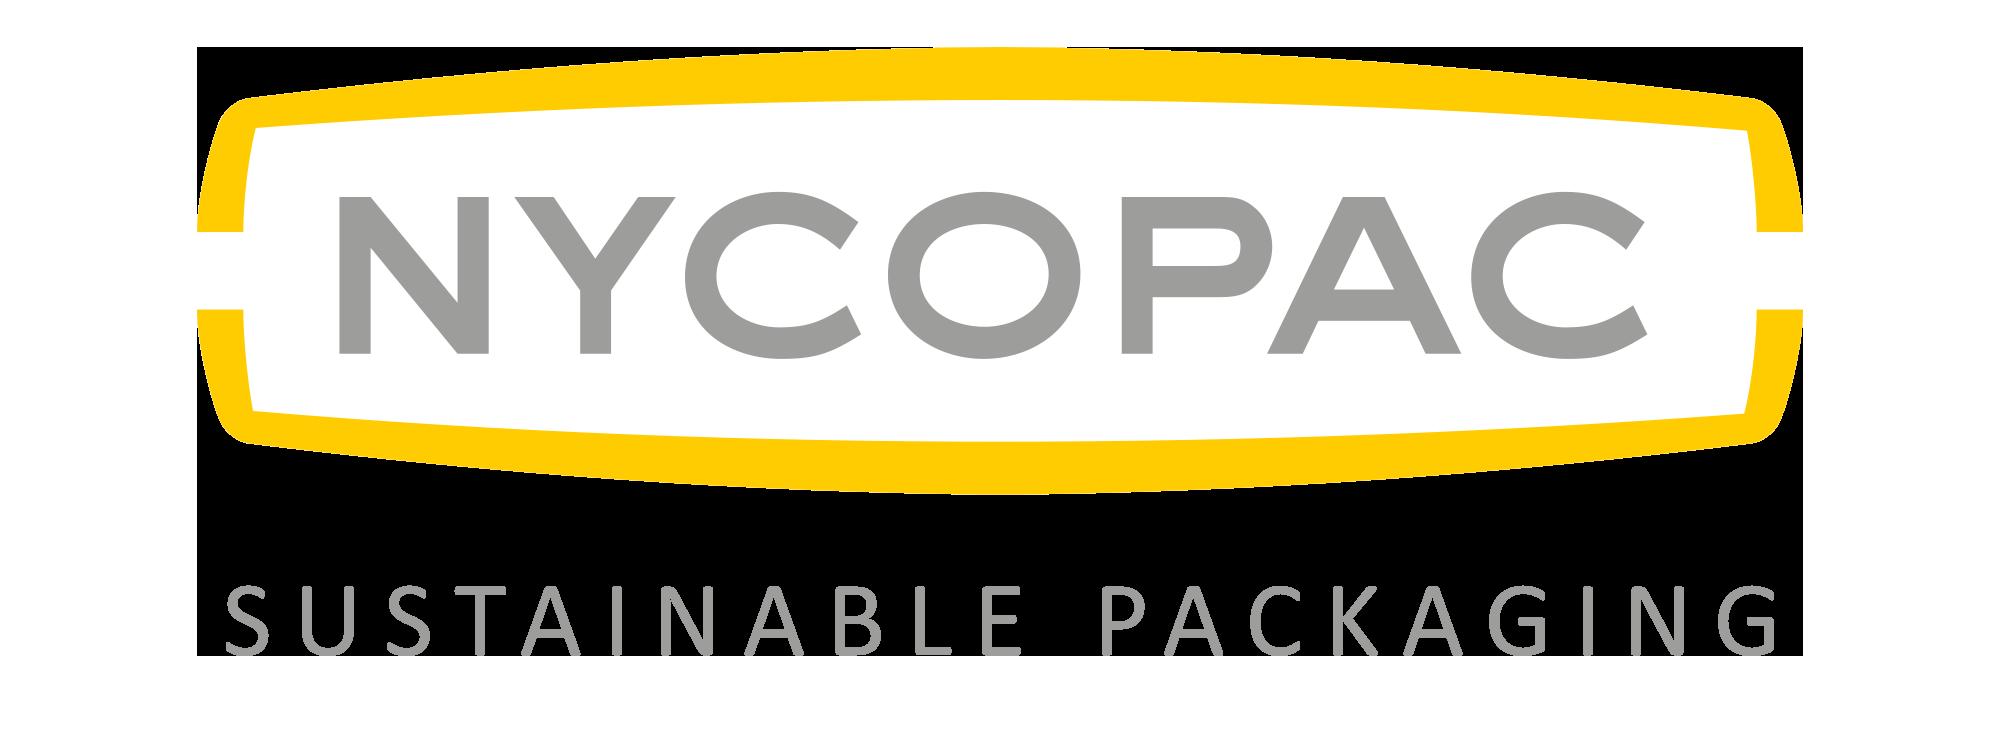 Nycopac